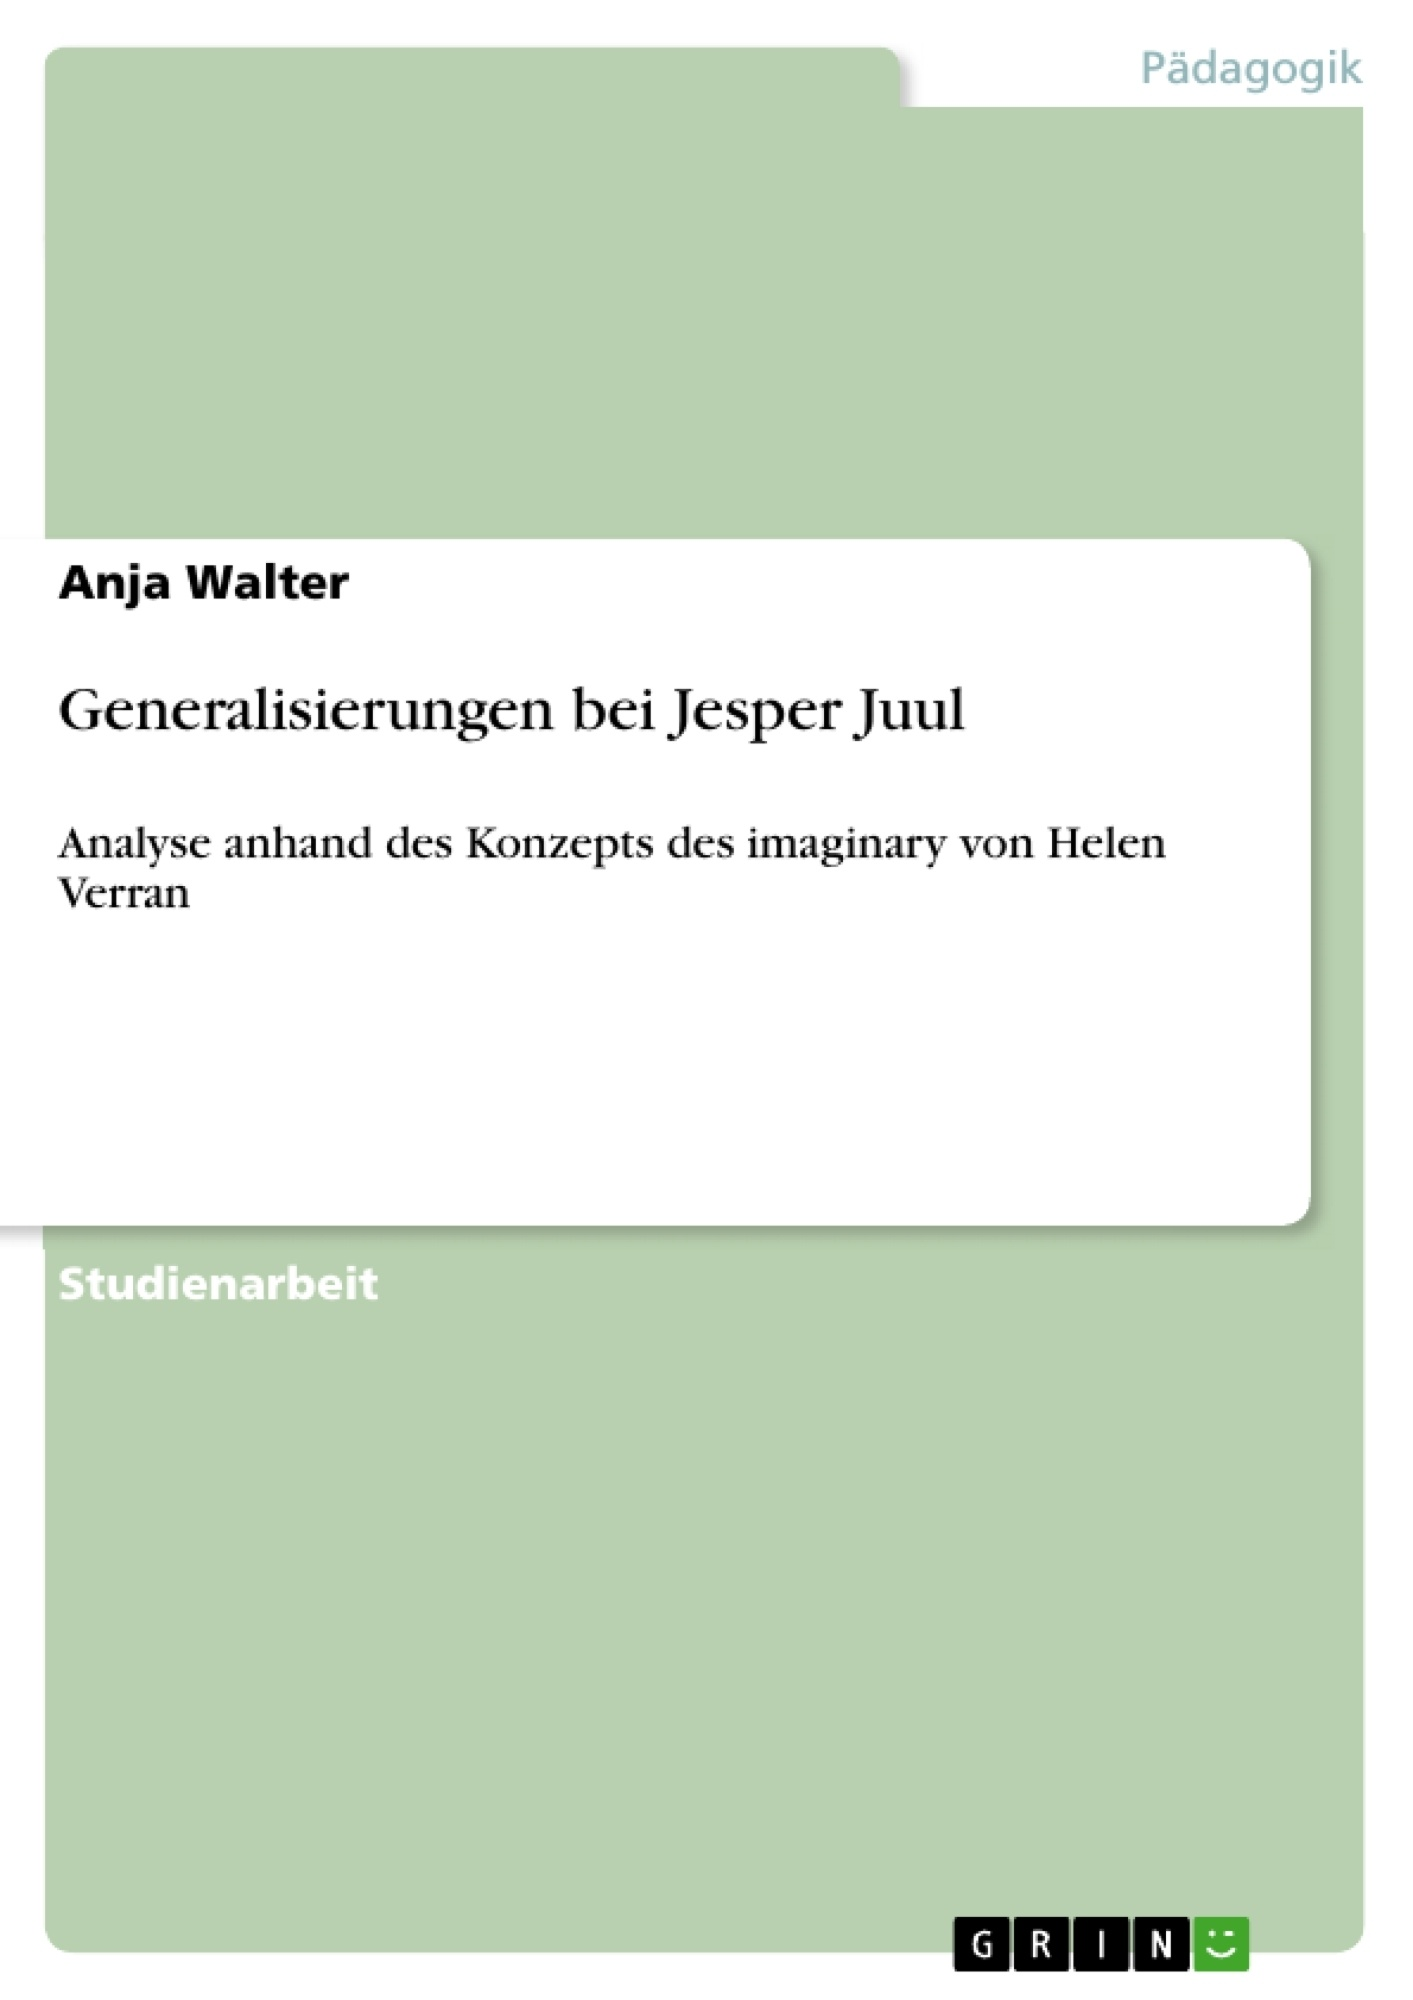 Titel: Generalisierungen bei Jesper Juul